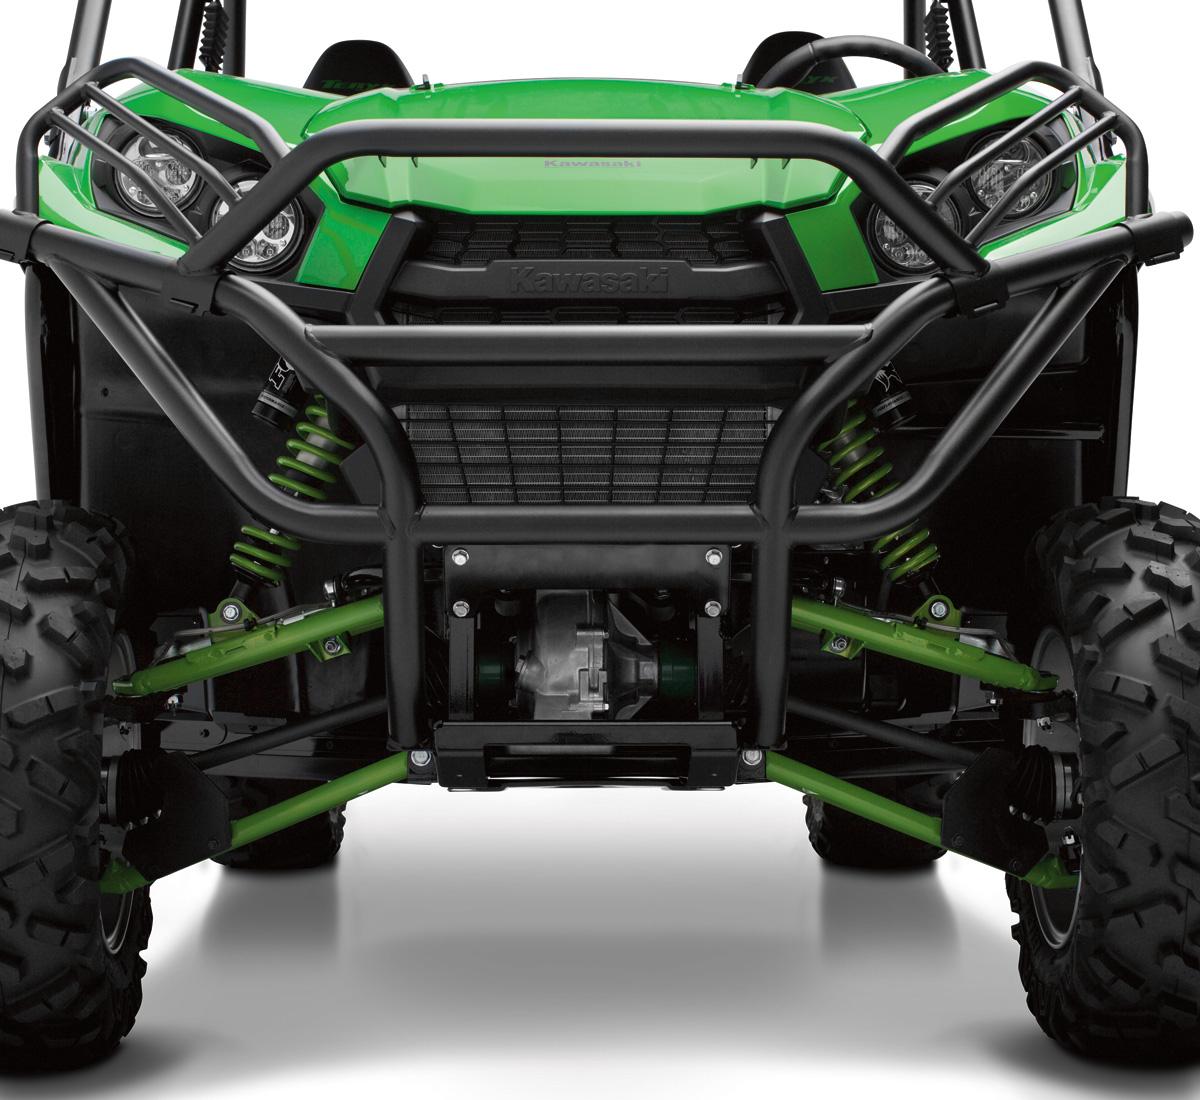 2017 Kawasaki Teryx Wiring Diagram 2008 Teryx4 Le Side X By